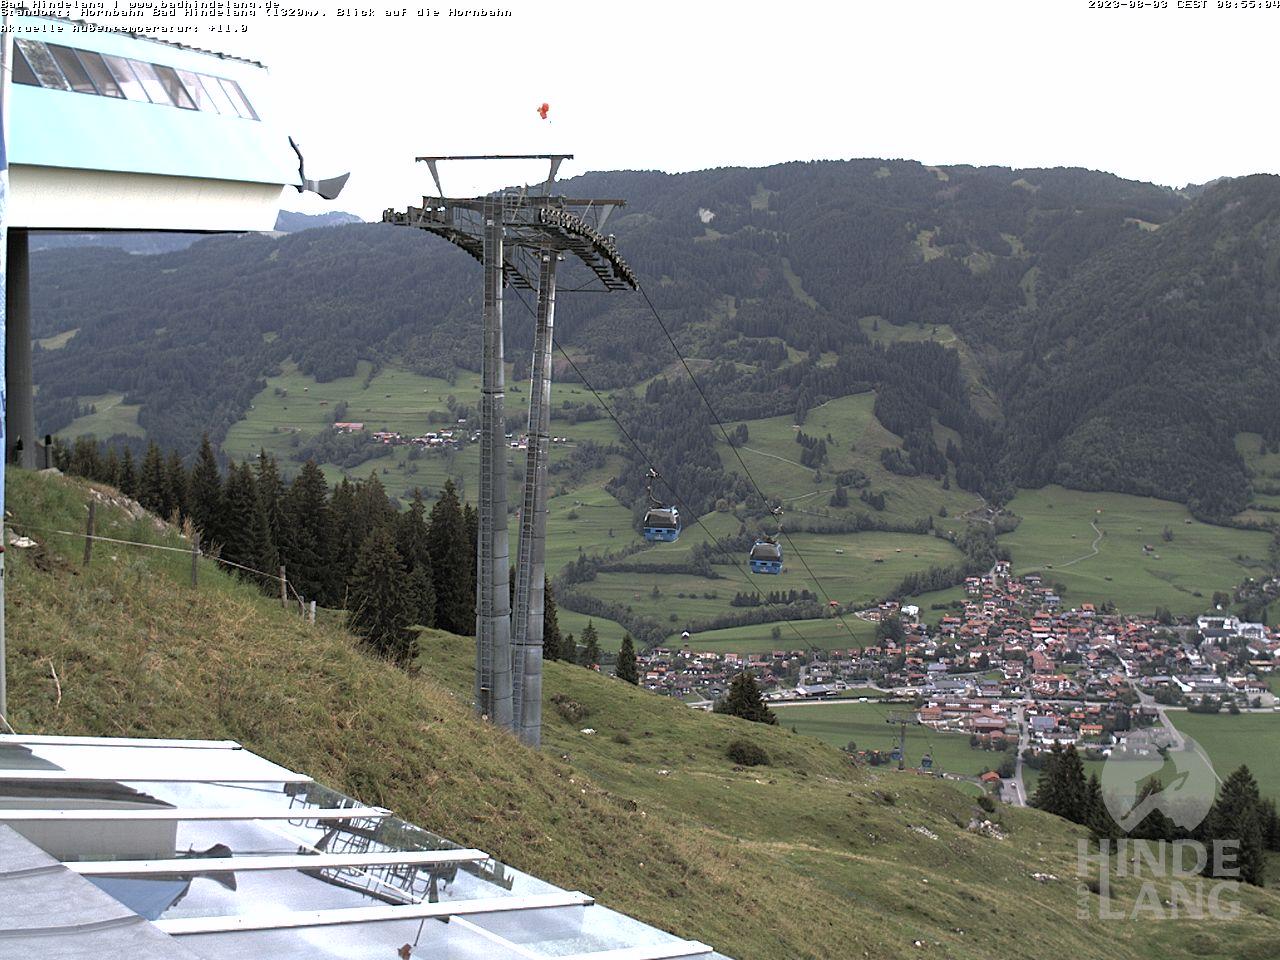 Bergstation Hornbahn Hindelang